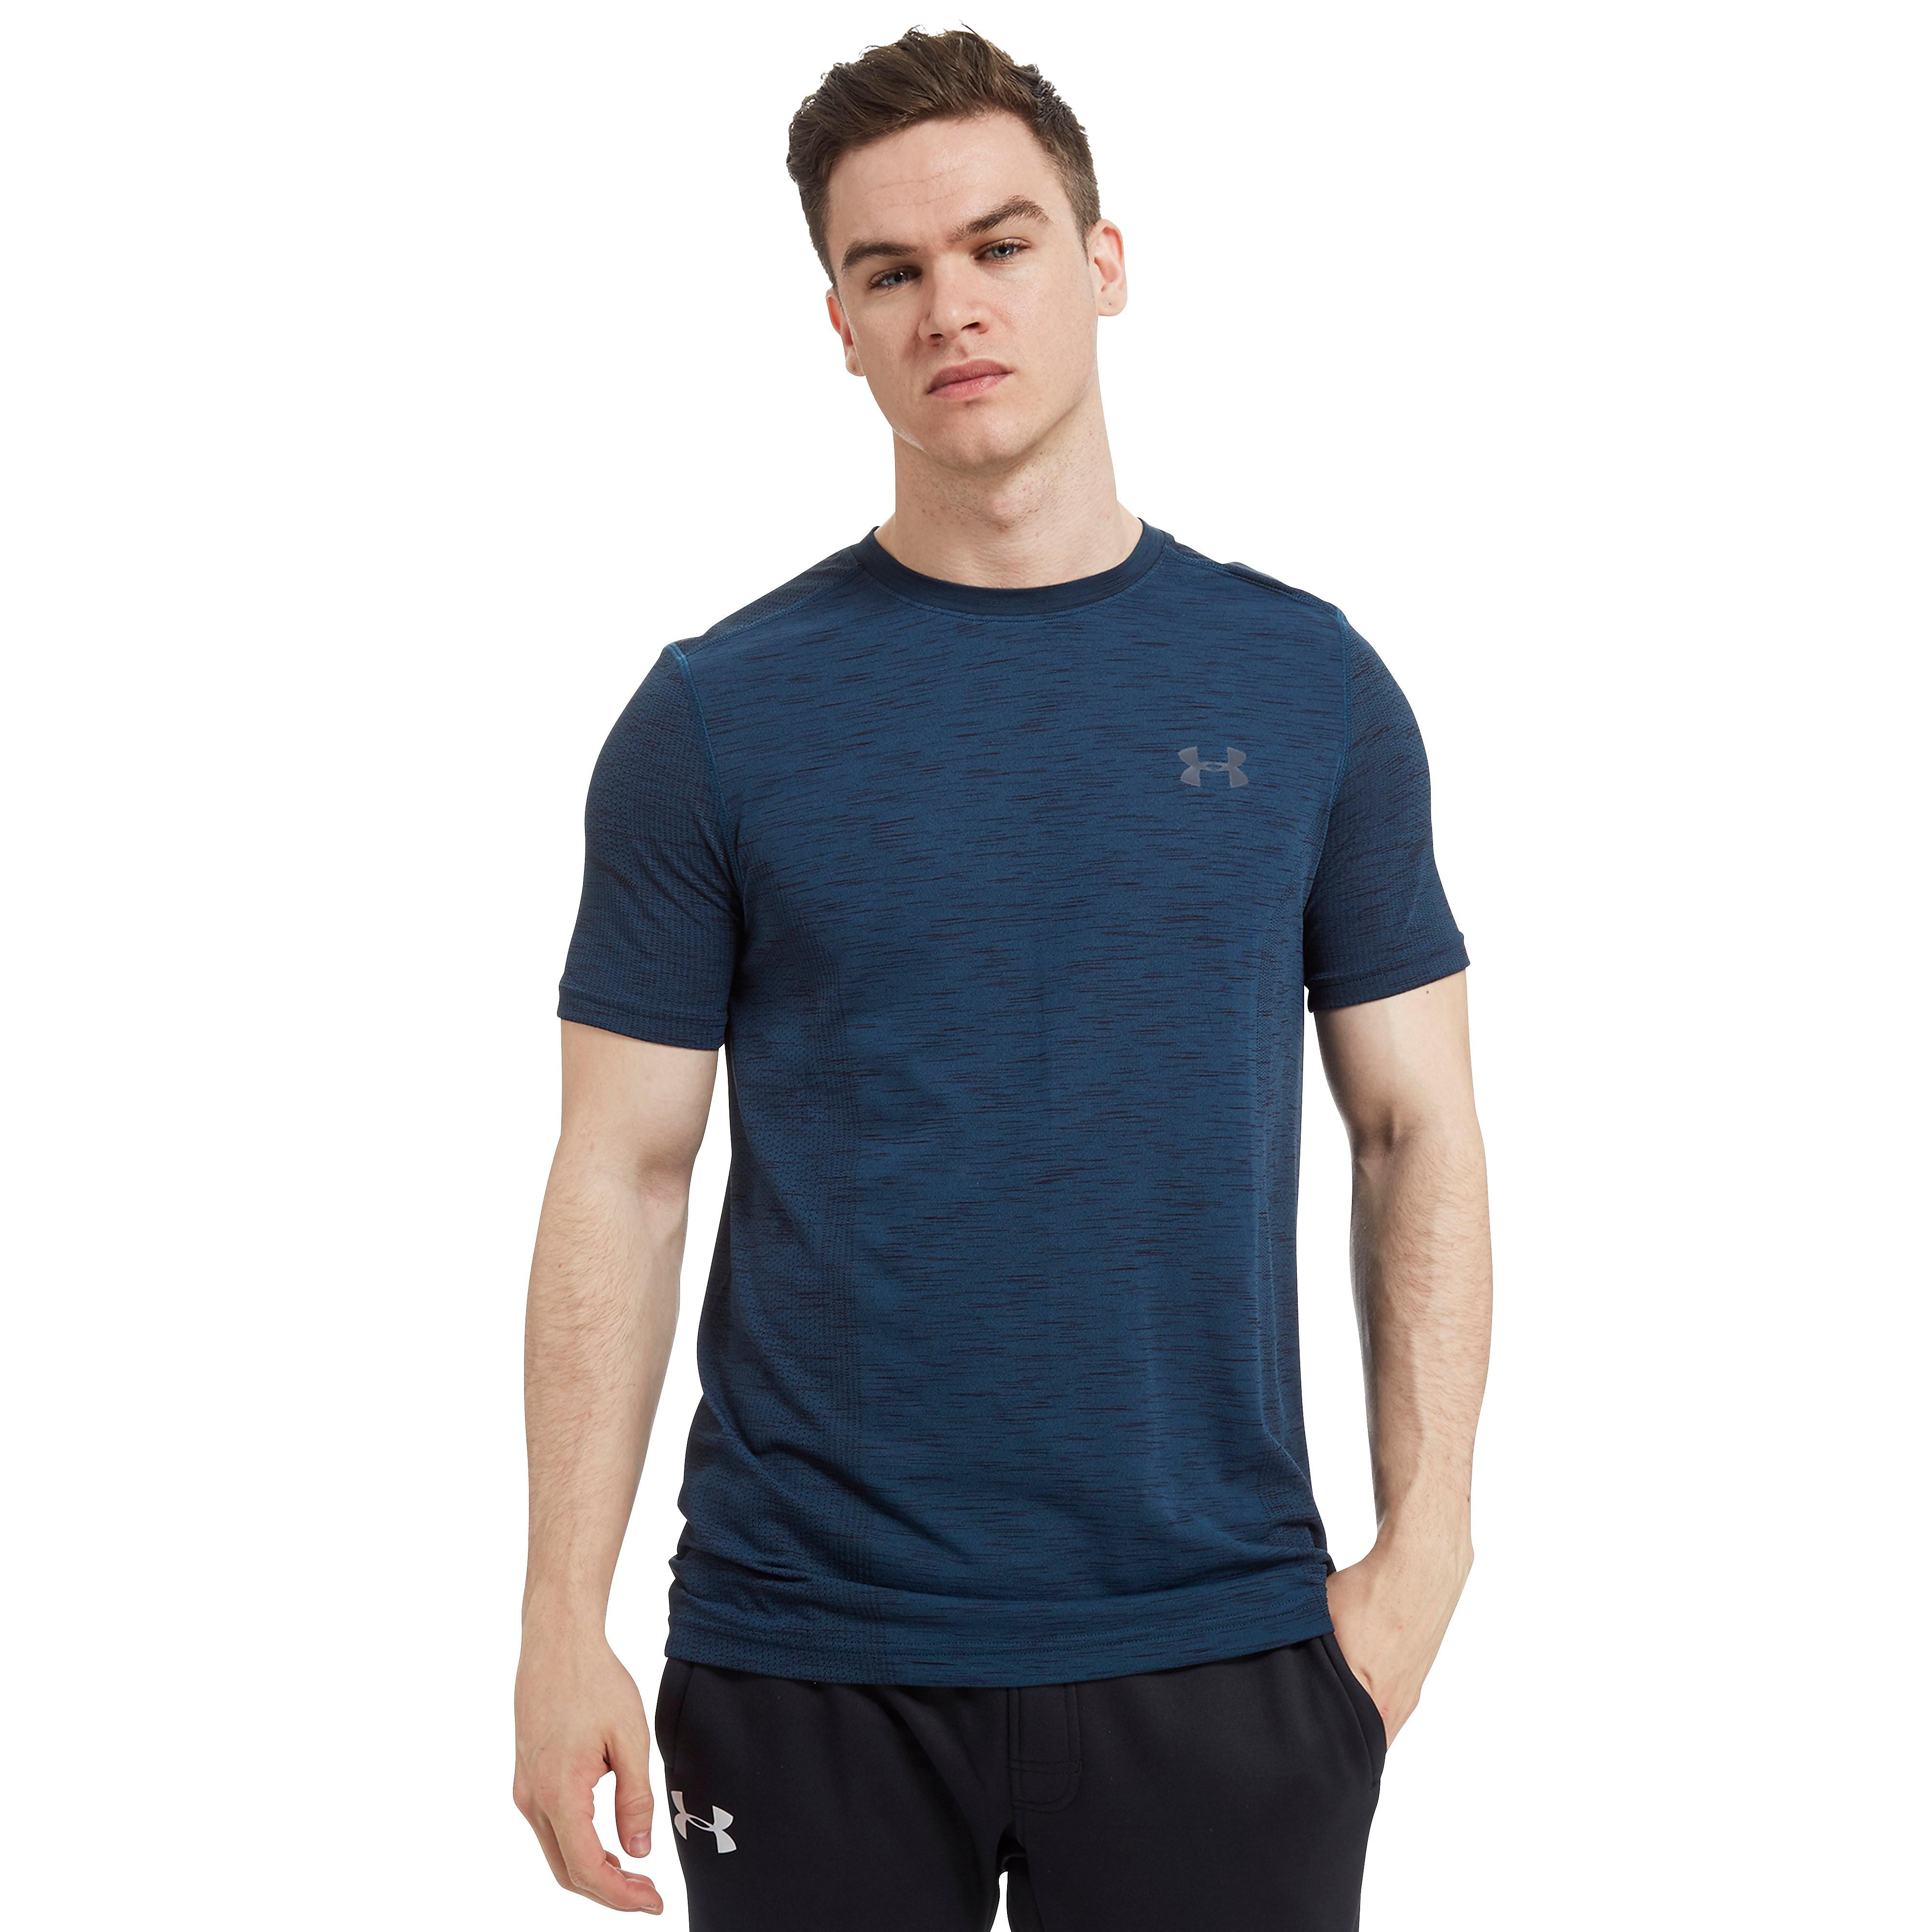 Under Armour Men's Threadborne T-Shirt